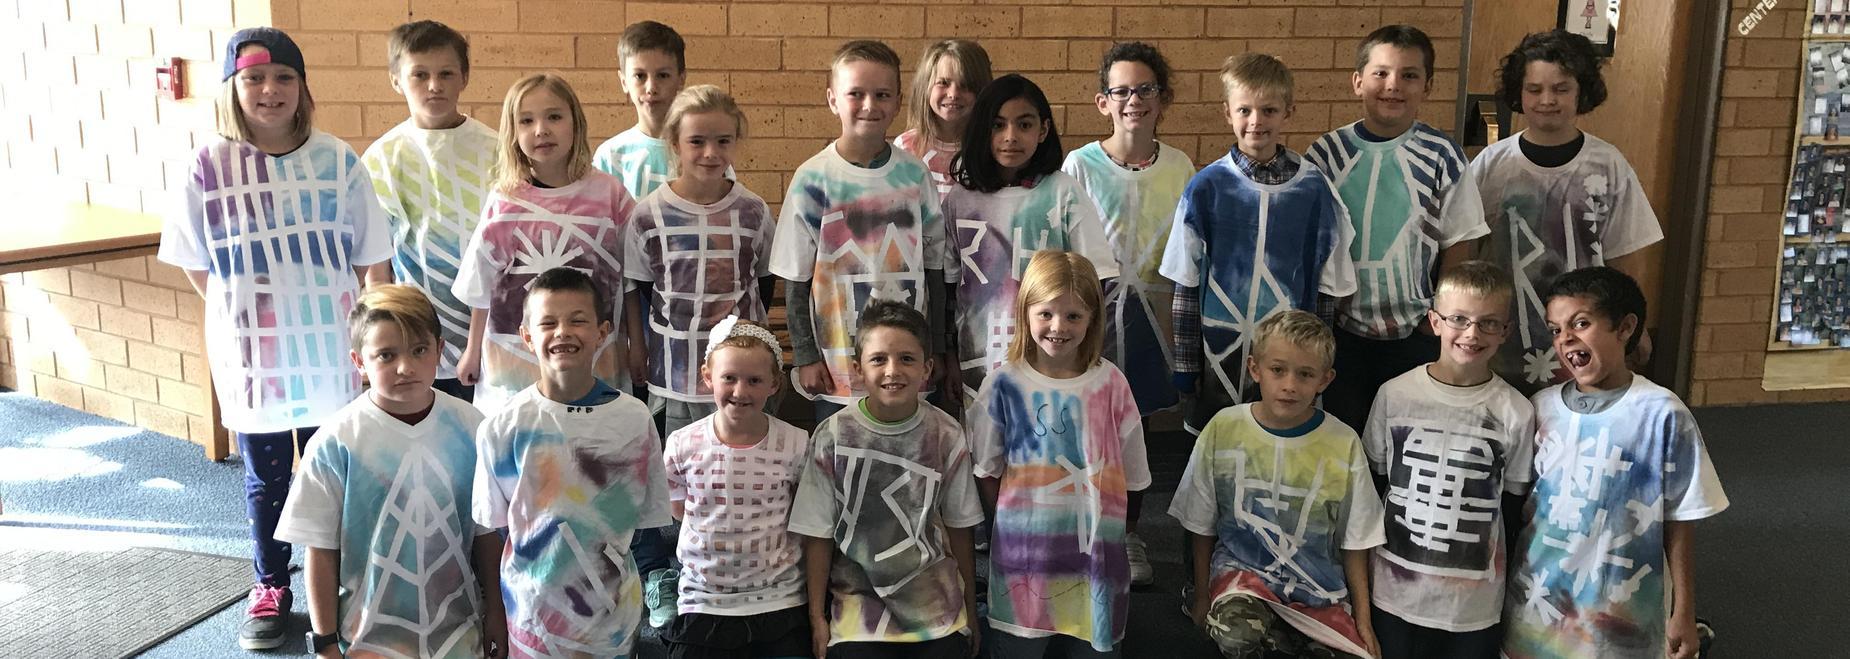 Mrs. Largent's class did graffiti art shirts as a class!